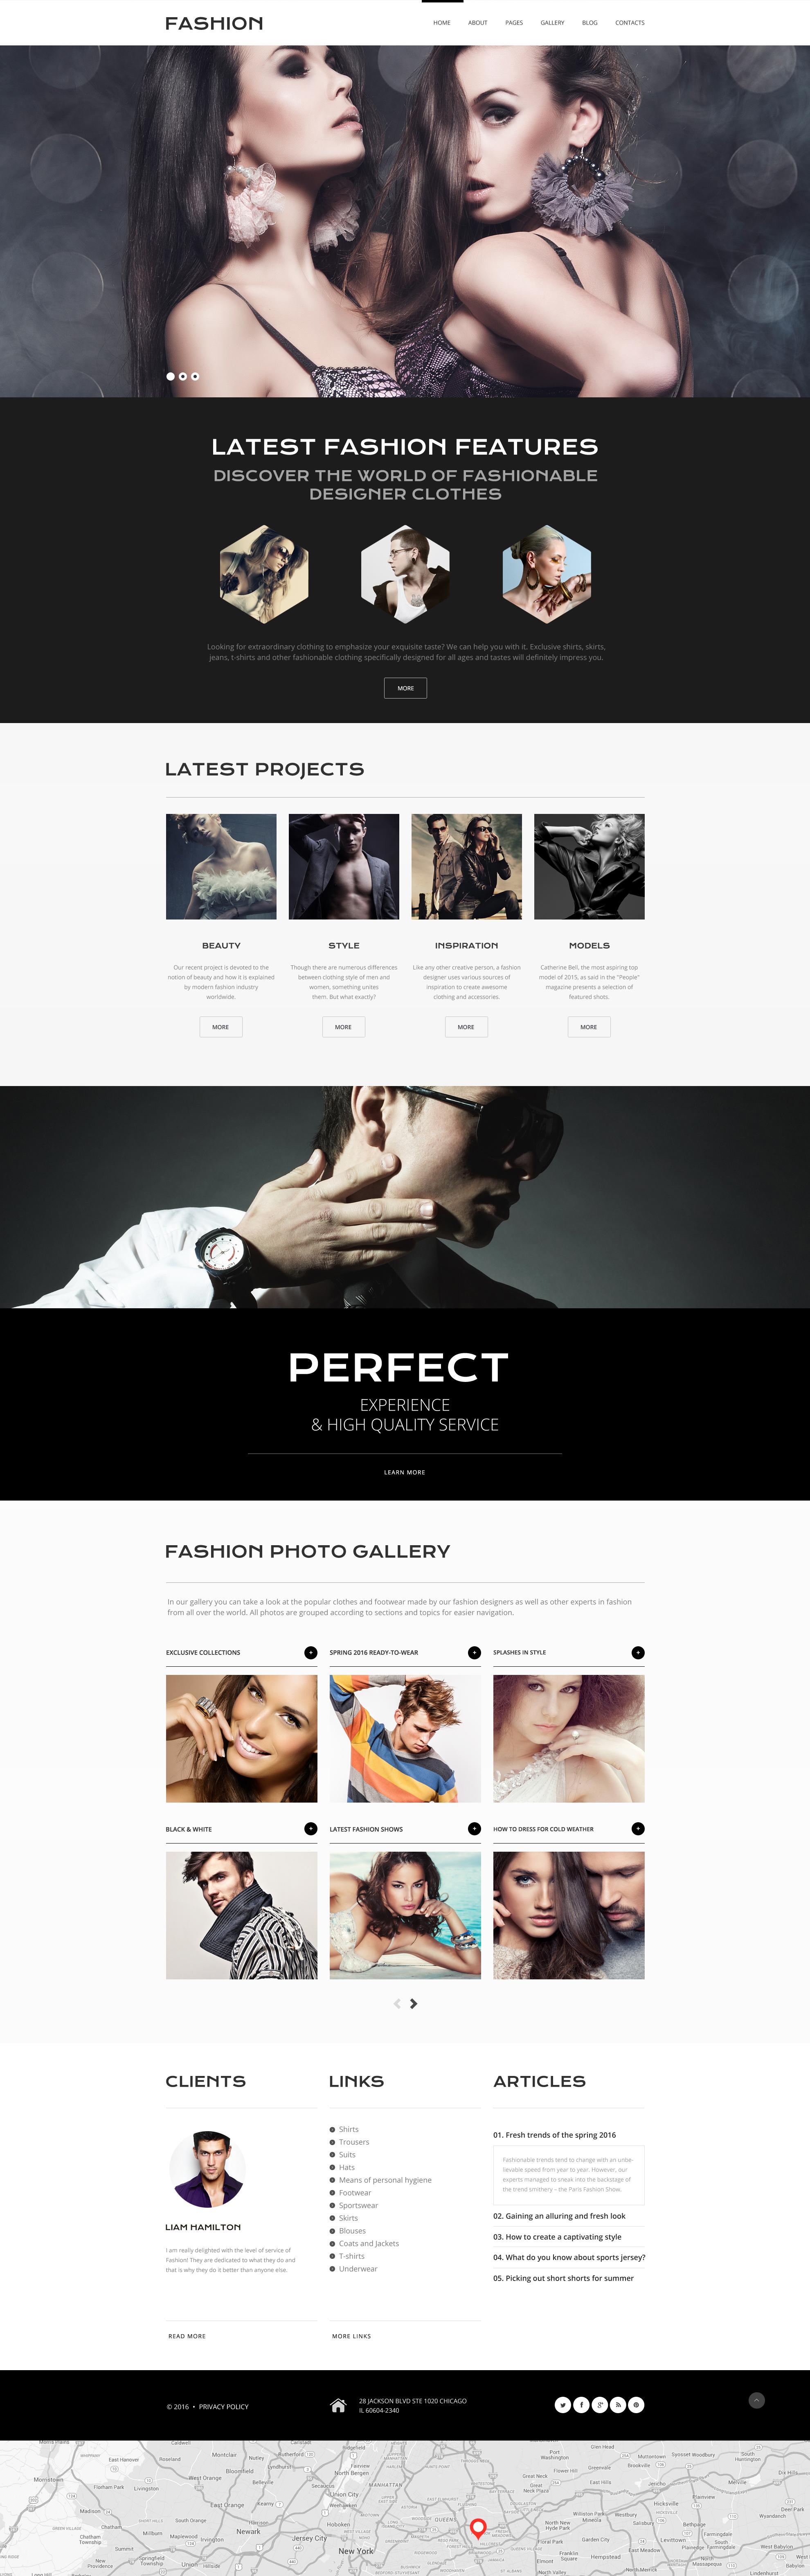 Online Fashion Joomla Template - screenshot